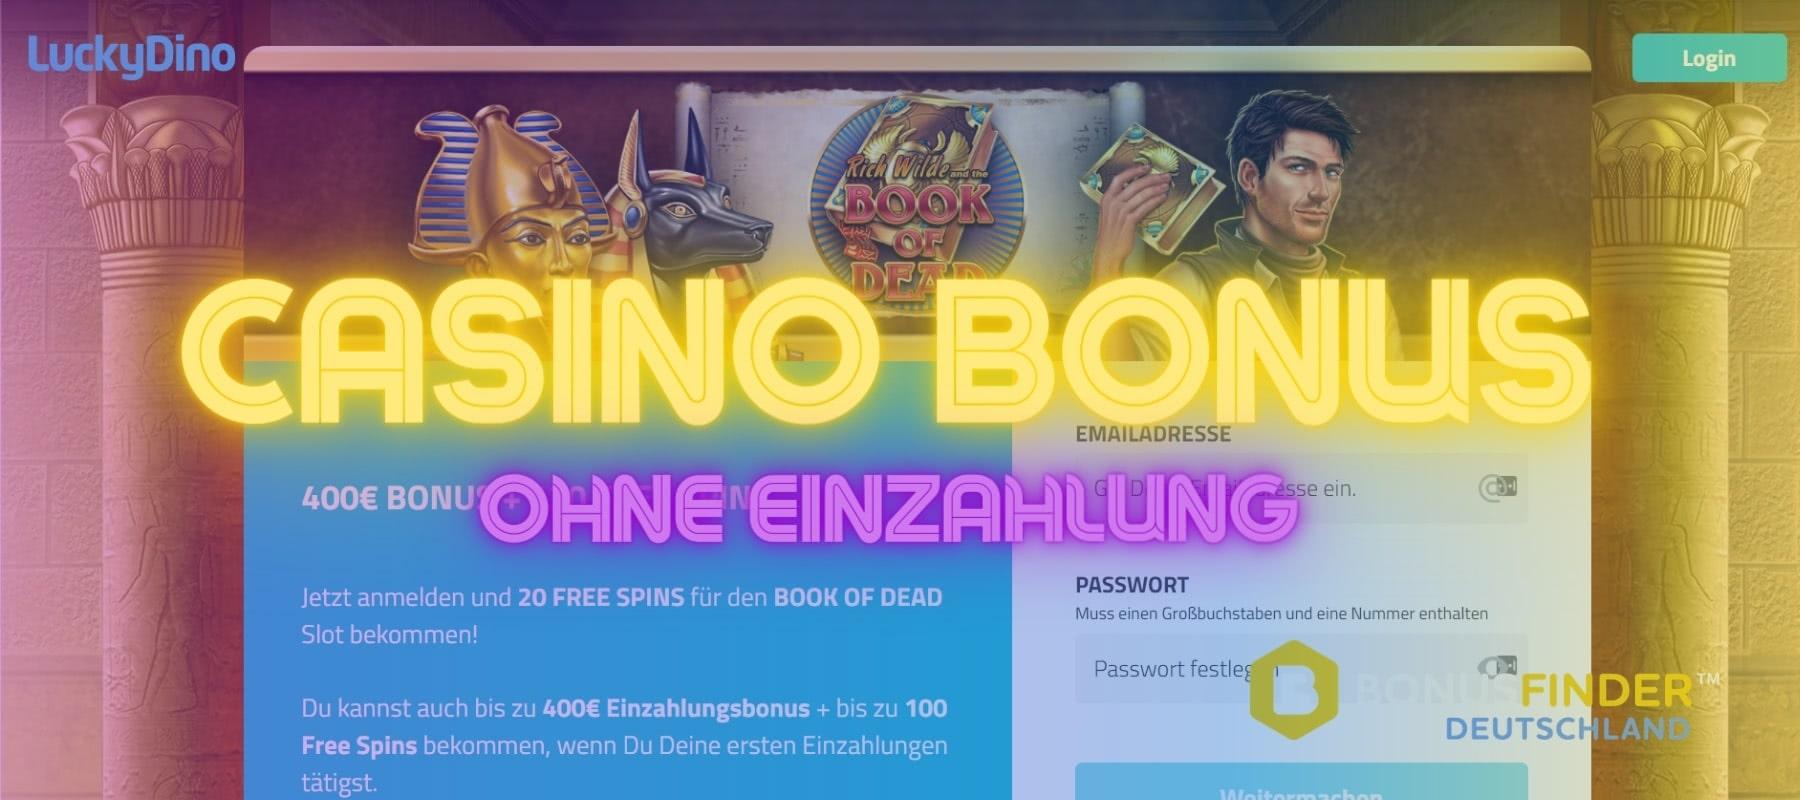 lucky dino casino bonus ohne einzahlung